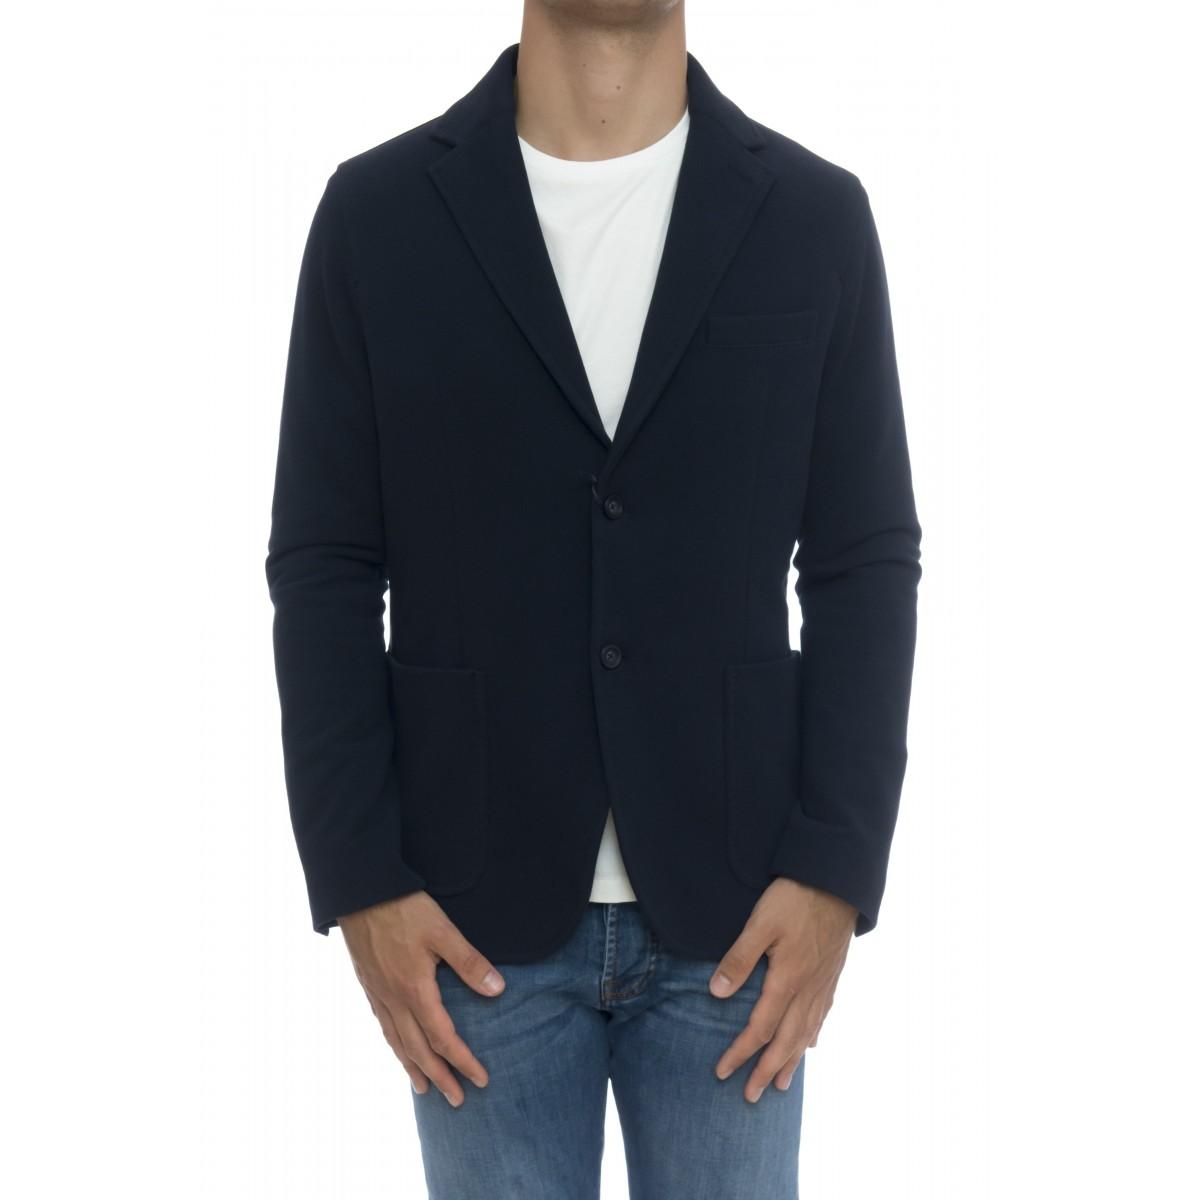 Giacca uomo - Cn2330 giacca unita jersey strech